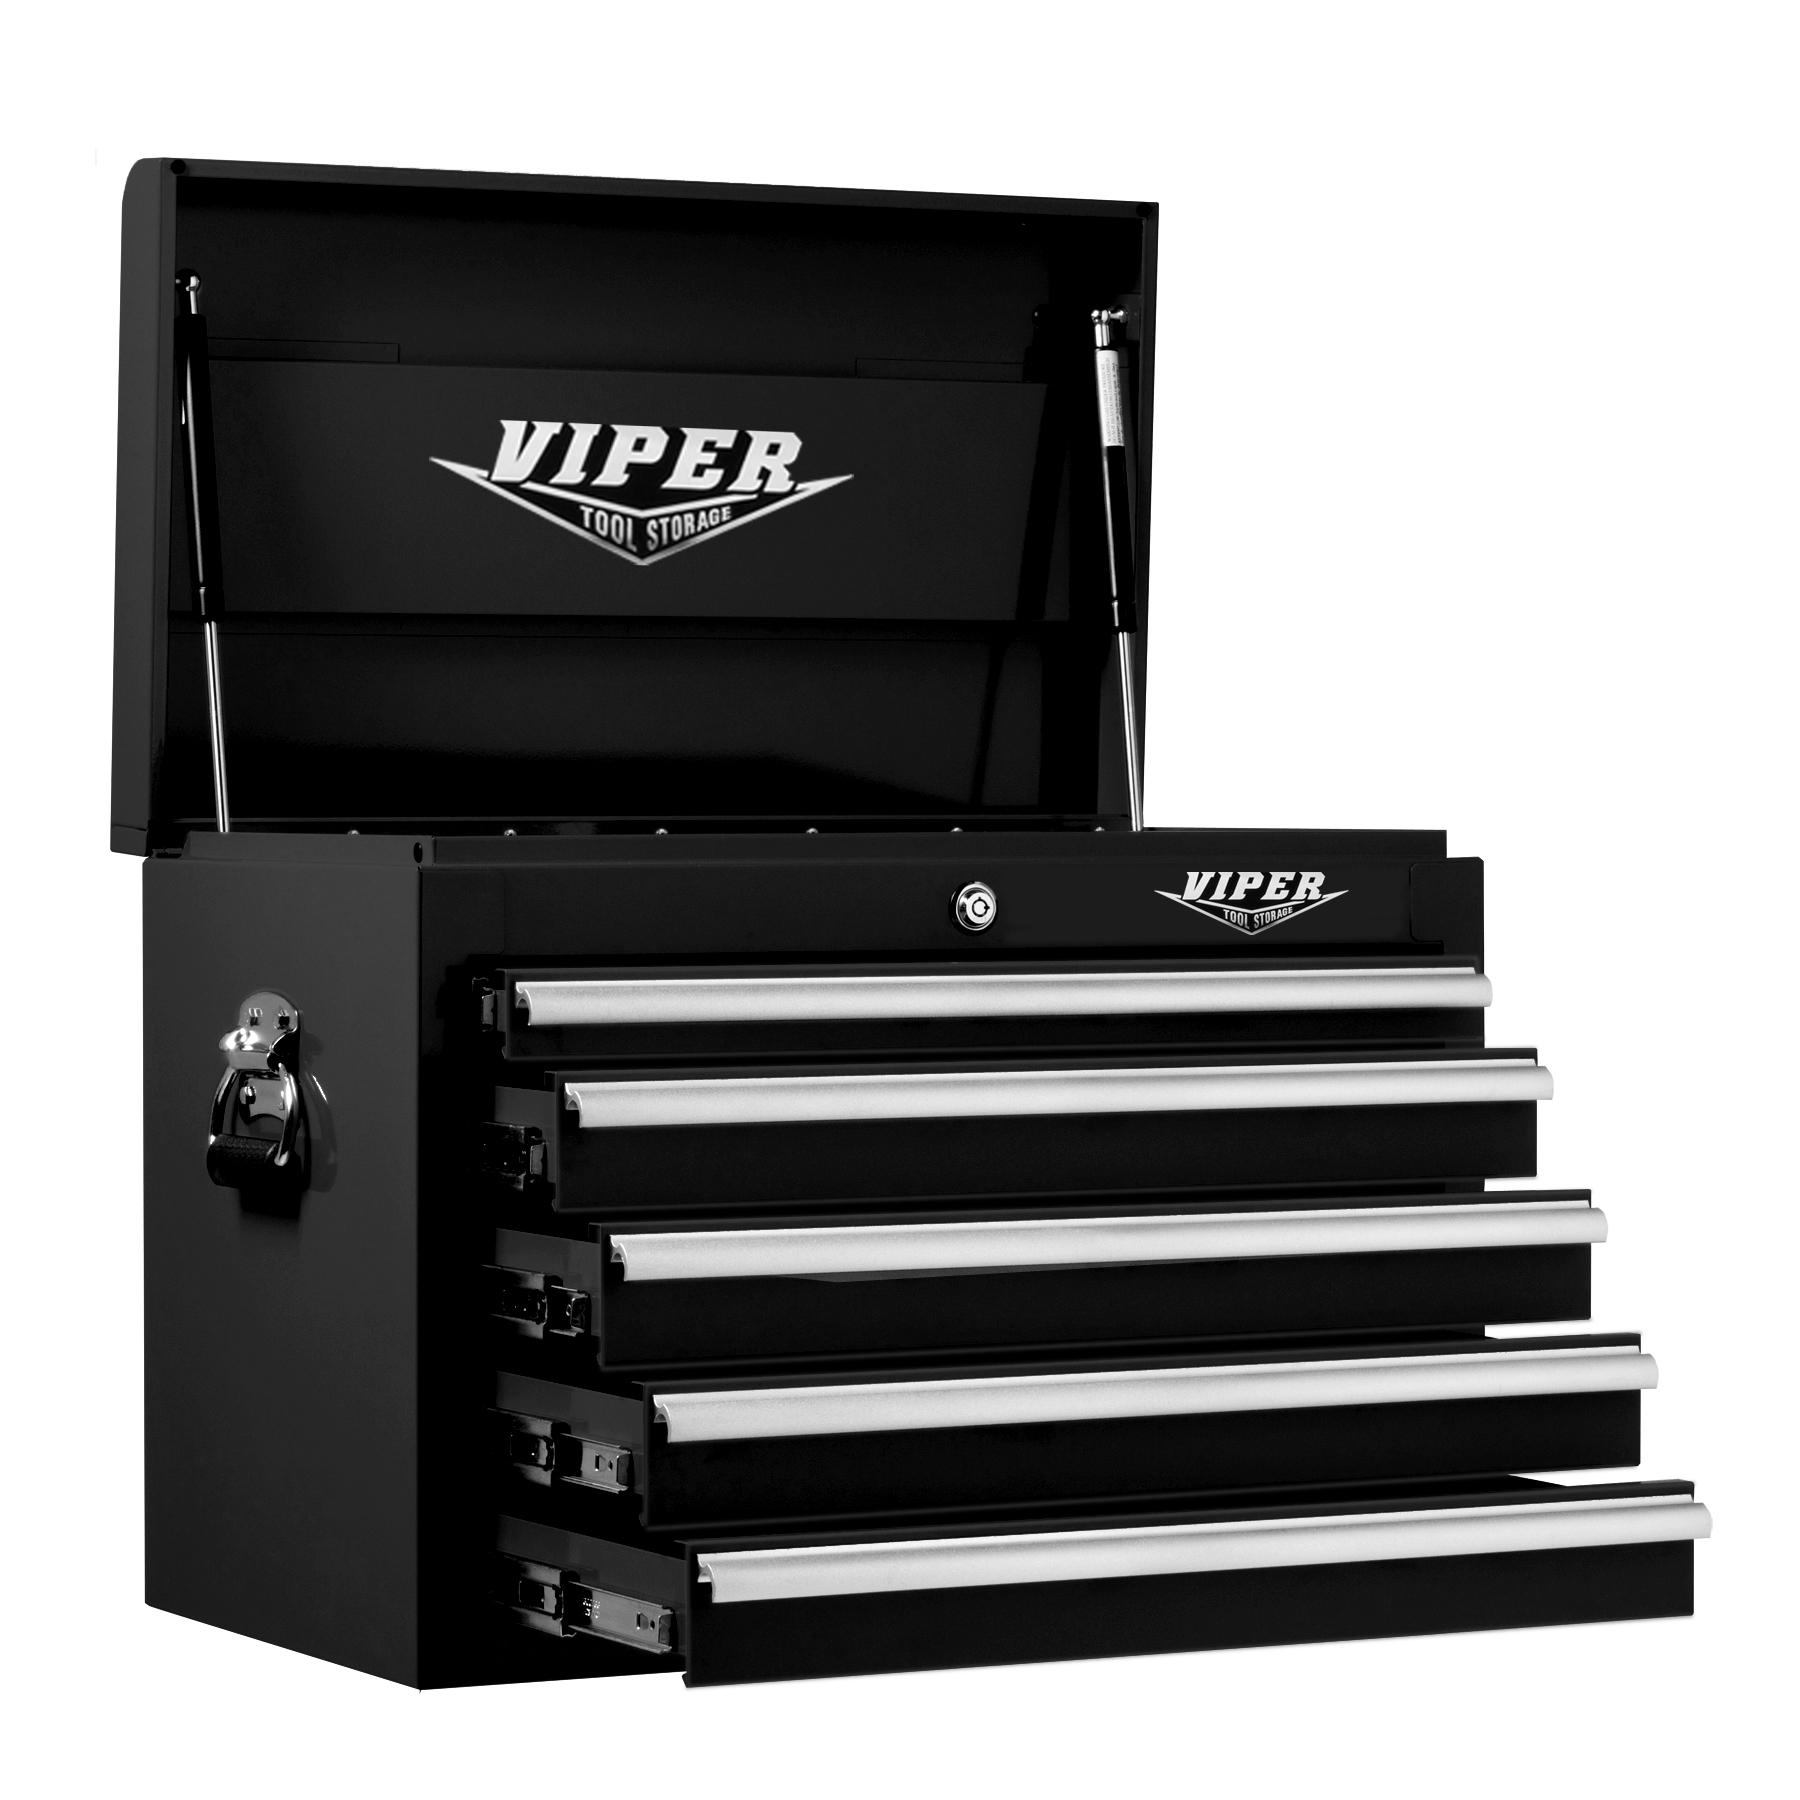 Viper Tool Storage 26 5 Drawer 18G Steel Top Chest Black